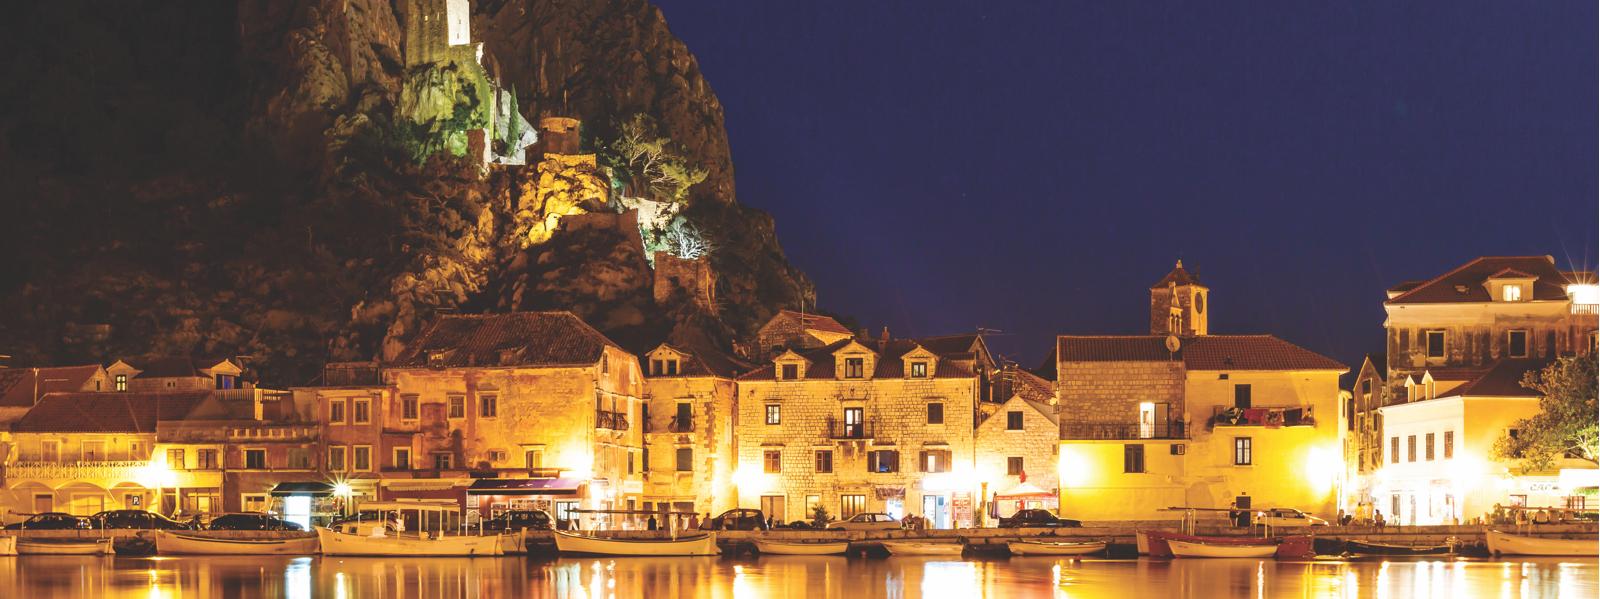 Naslovnica uvodna slika - prikazuje grad Omiš po noći